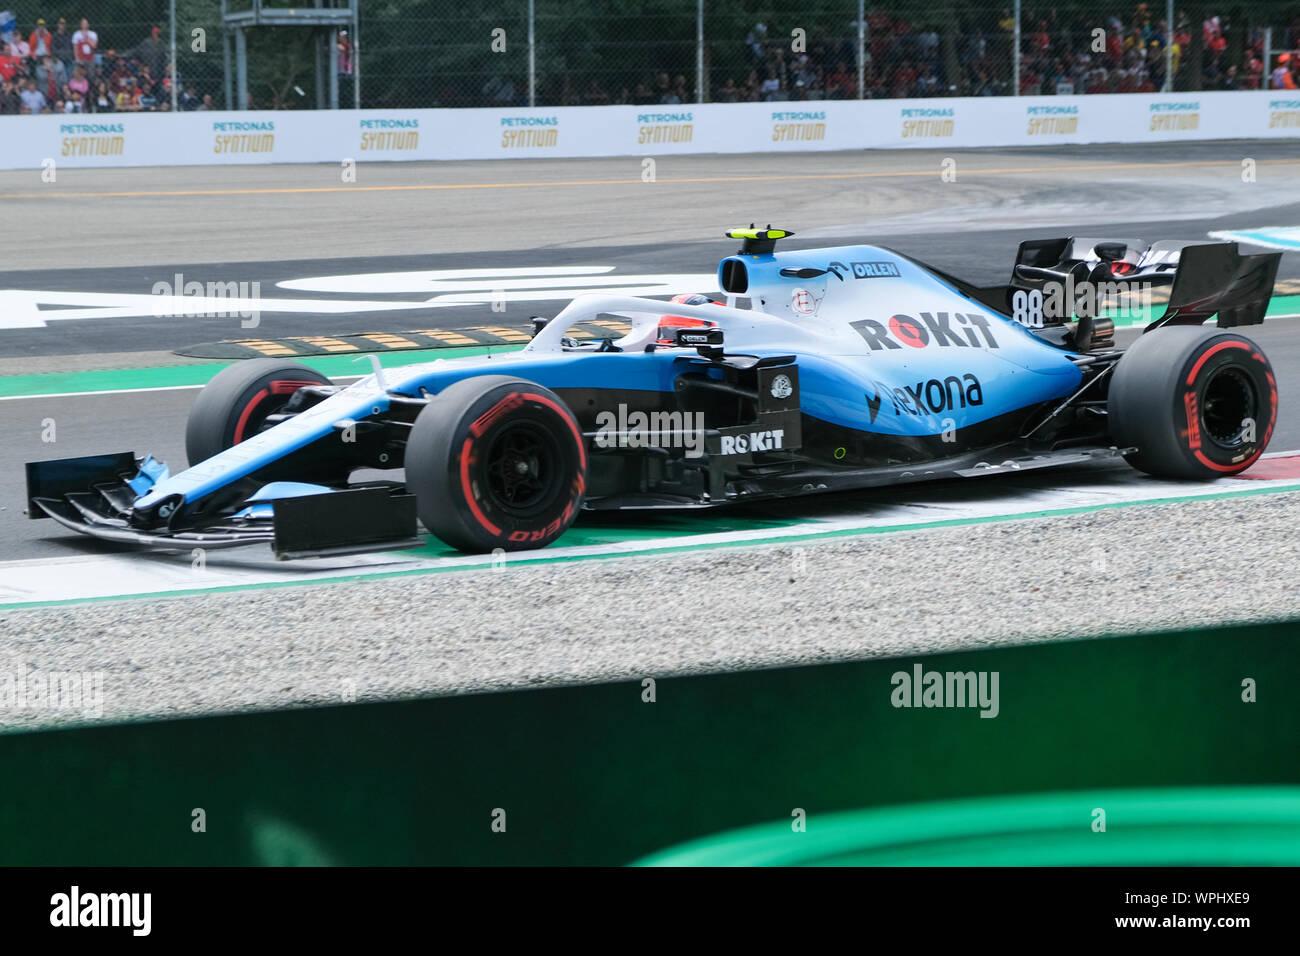 Mercedes AMG Petronas F1 Motorsport Drivers Maglietta Nero Ufficiale 2019